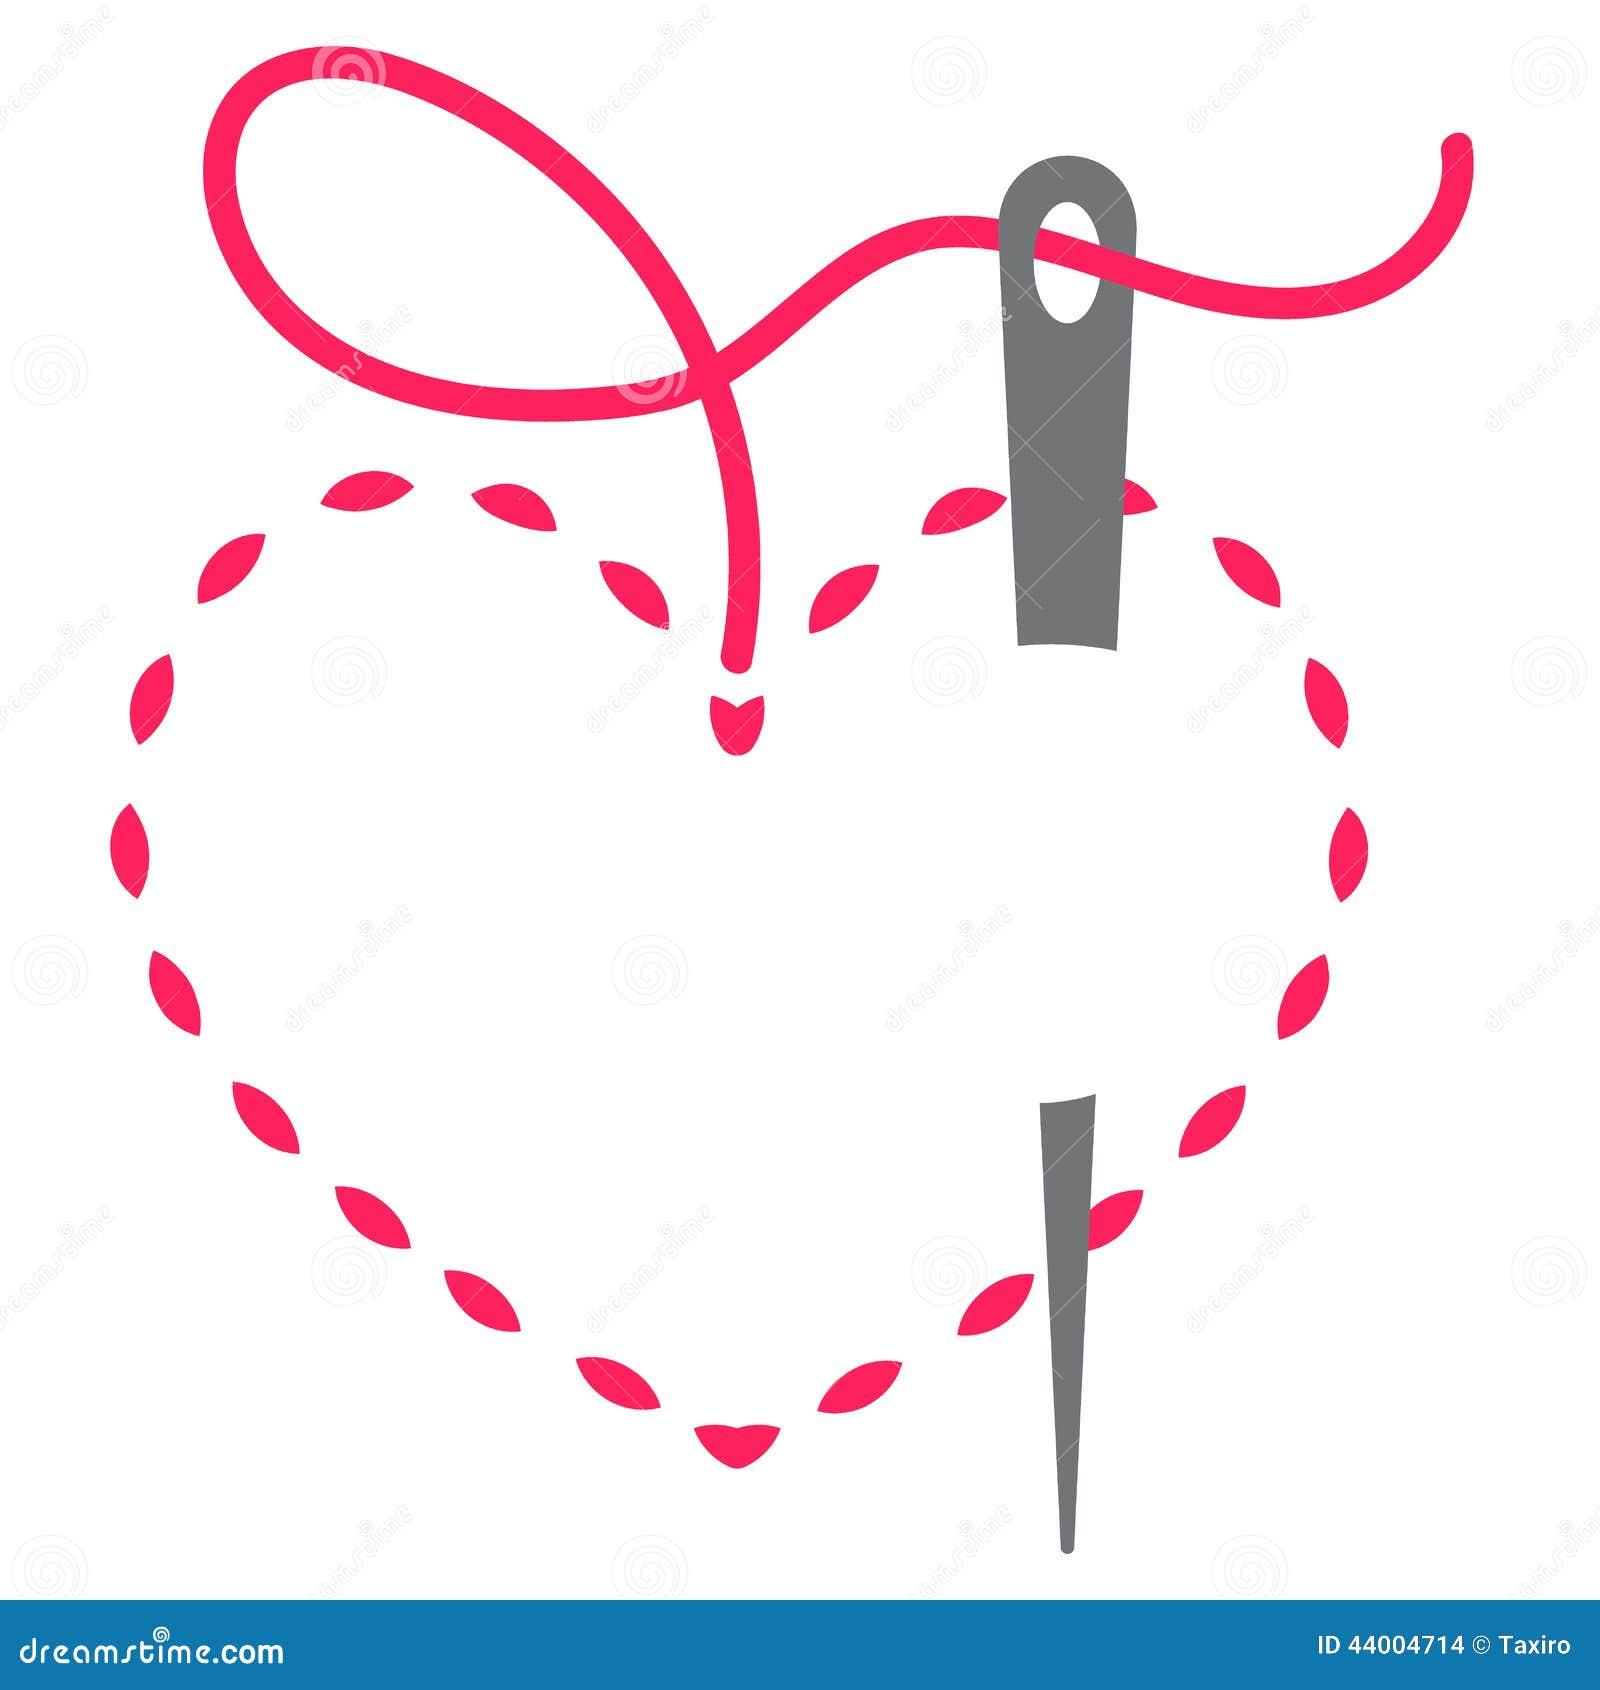 Heart and needle